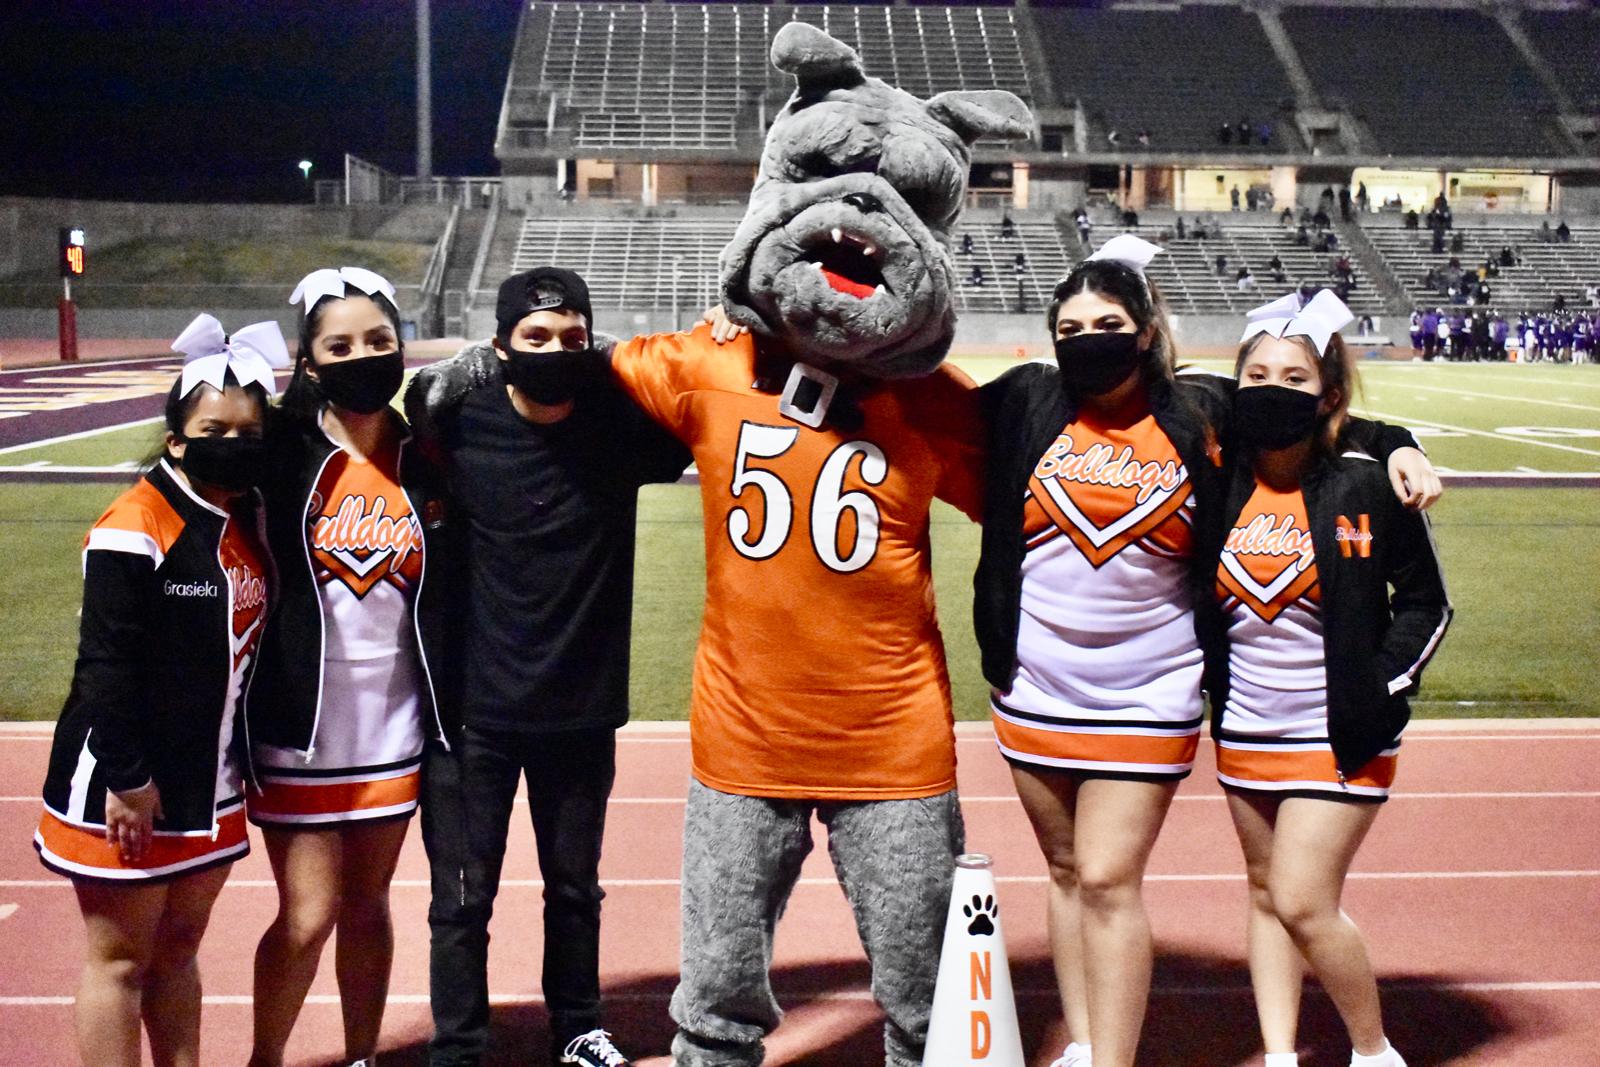 Photo gallery: North Dallas cheerleaders at Lincoln game — Nov. 6, 2020